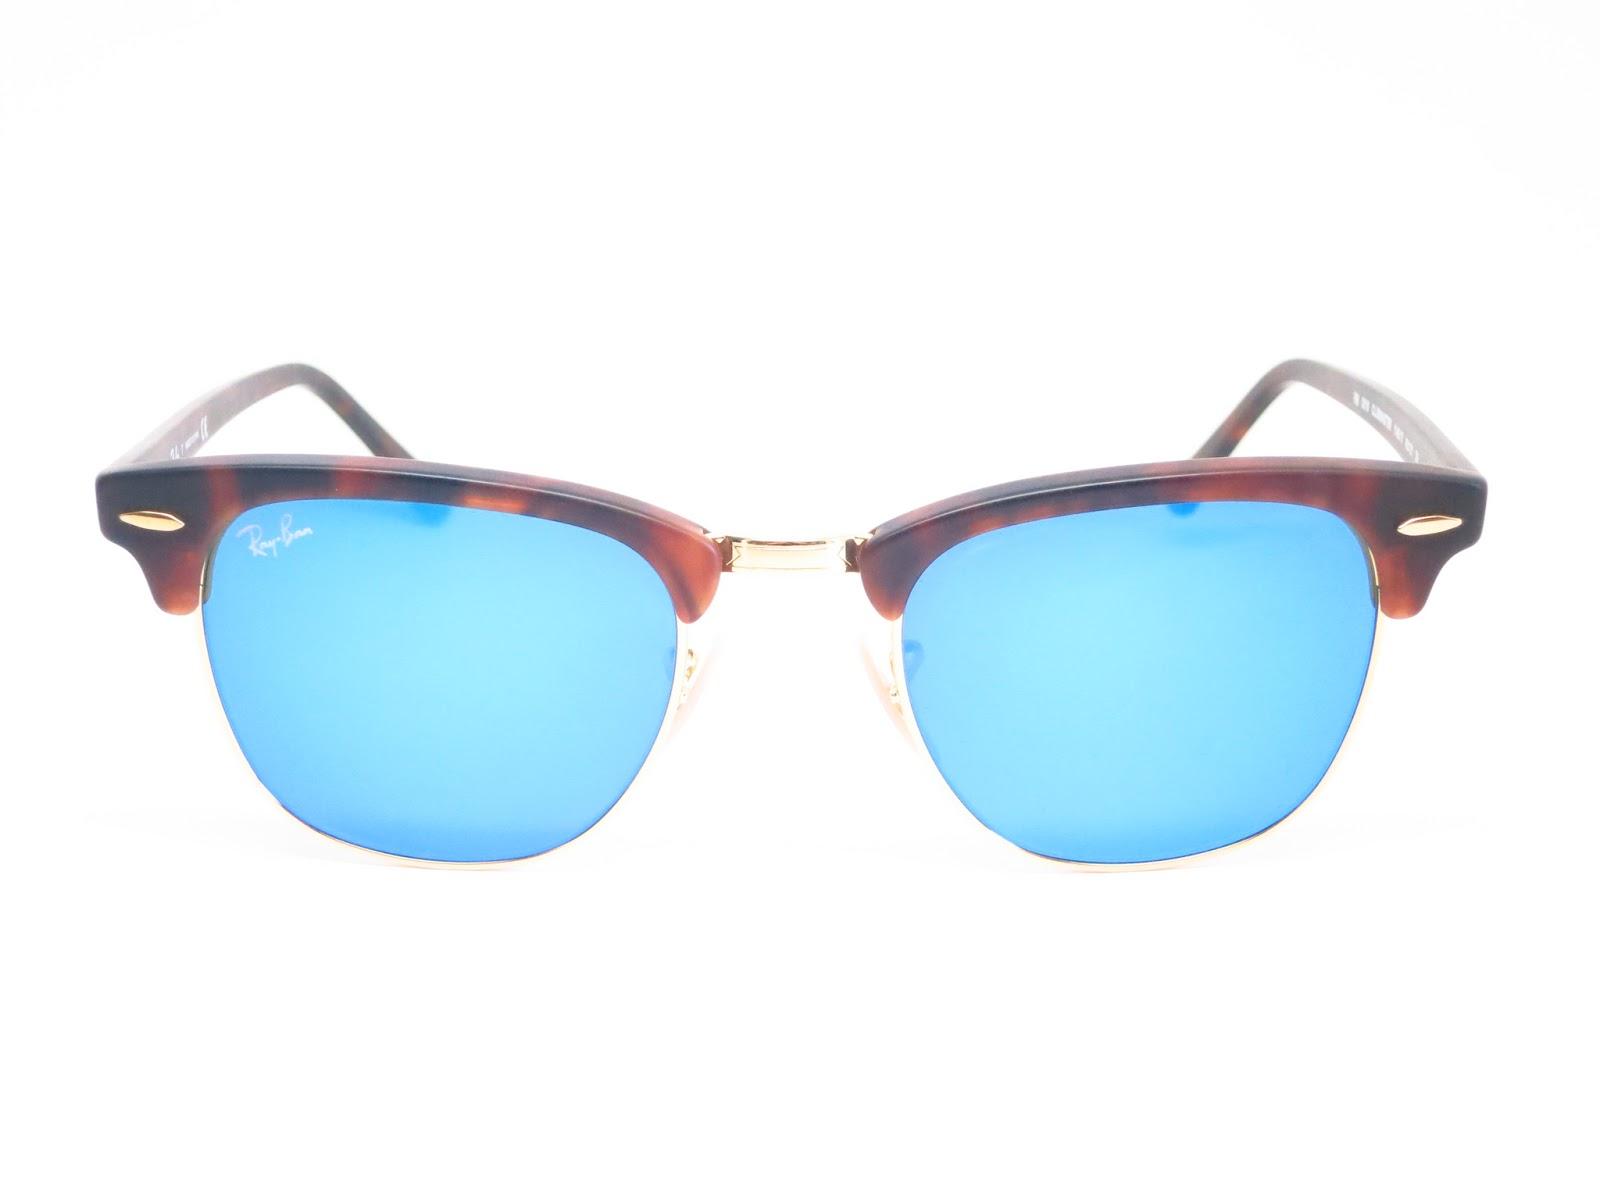 613723171a89 Ray-Ban RB 3016 Clubmaster 1145/17 Sand Havana / Gold Sunglasses   I ...